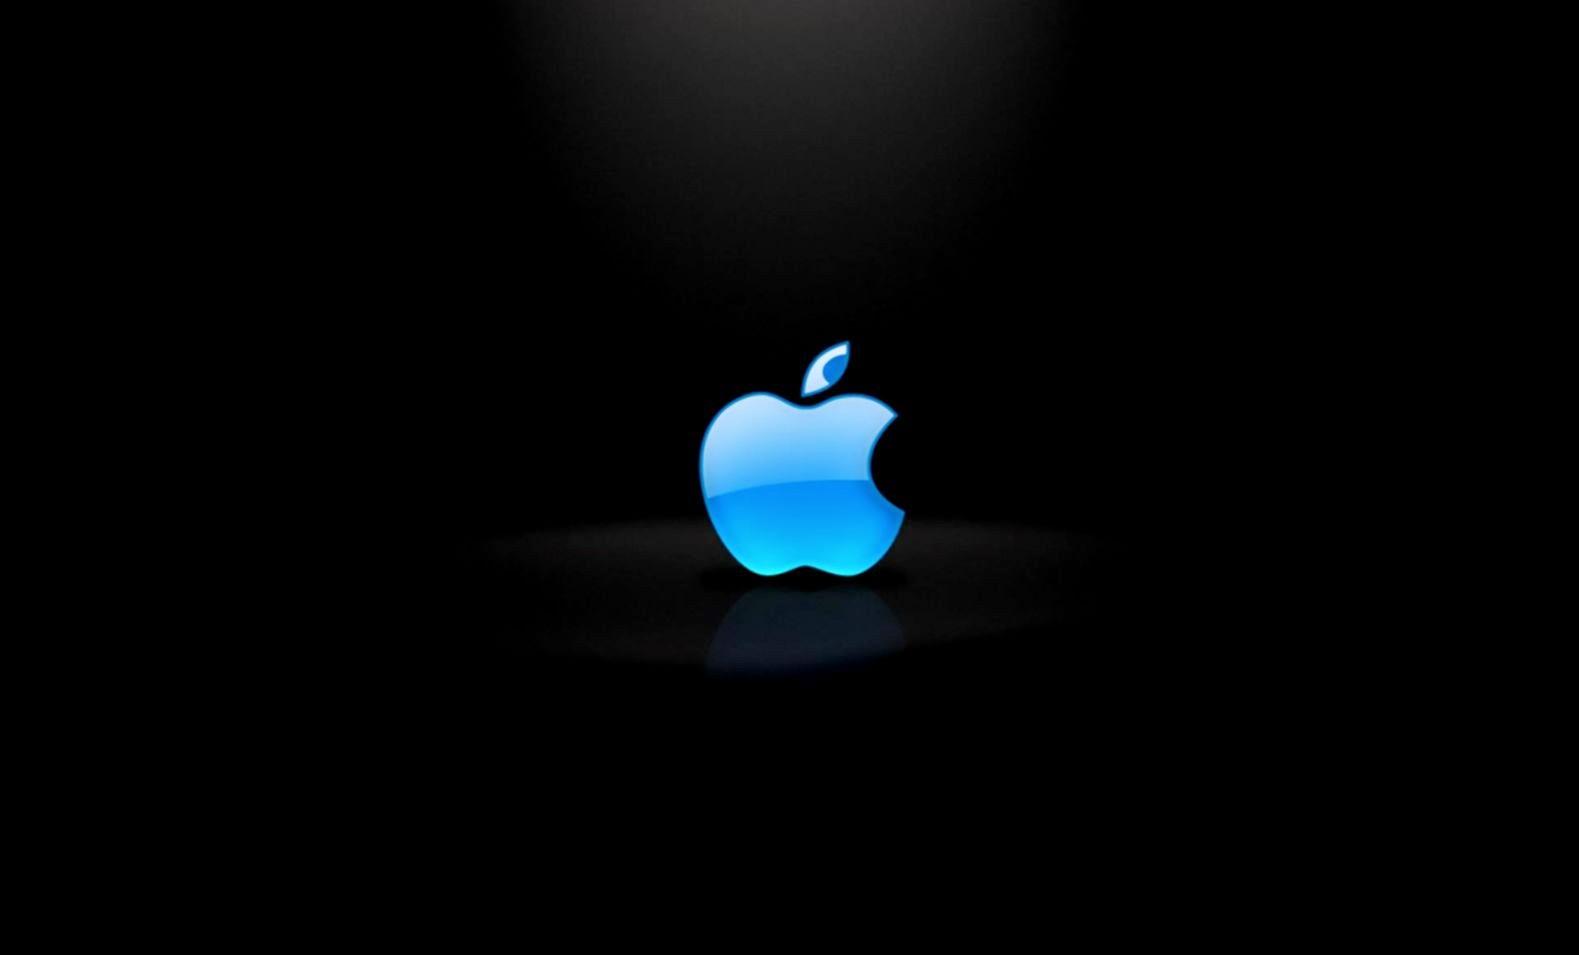 Download 1680x1050 Resolution of high definition imac dark desktop